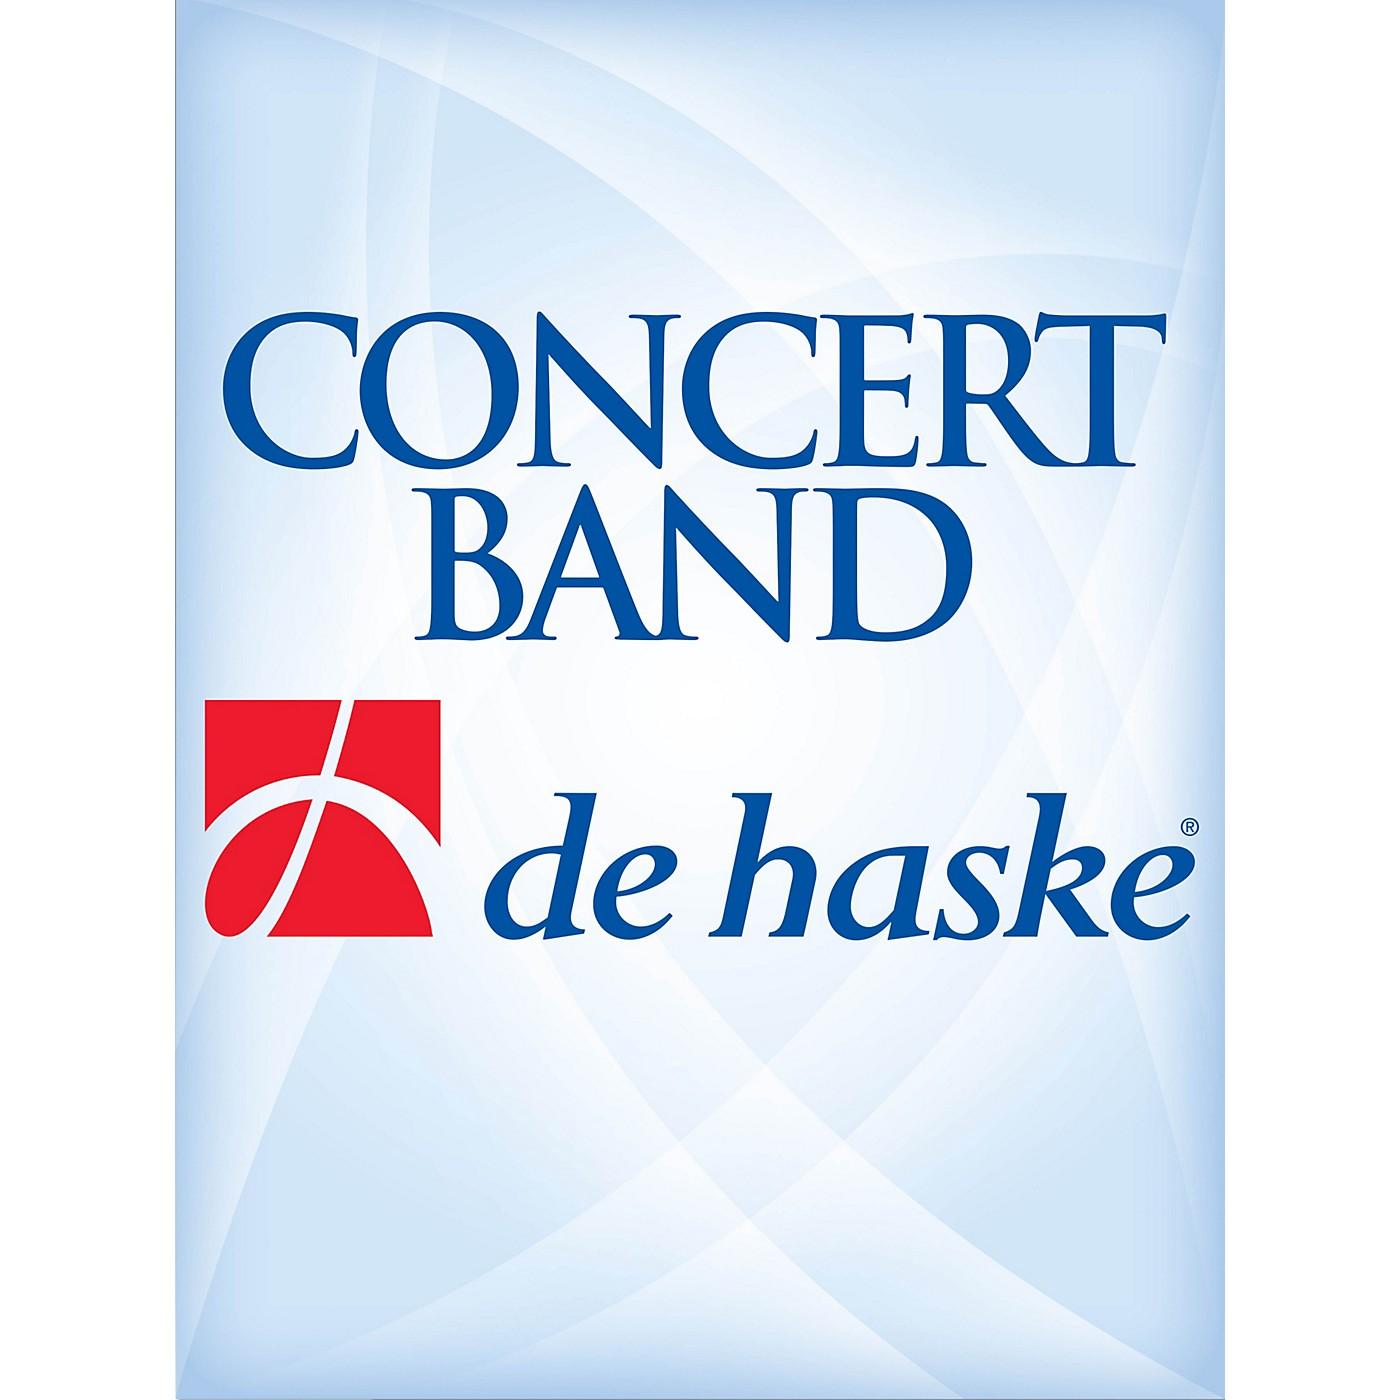 De Haske Music Earthquake (Score and Parts) Concert Band Level 6 Composed by Jan de Haan thumbnail